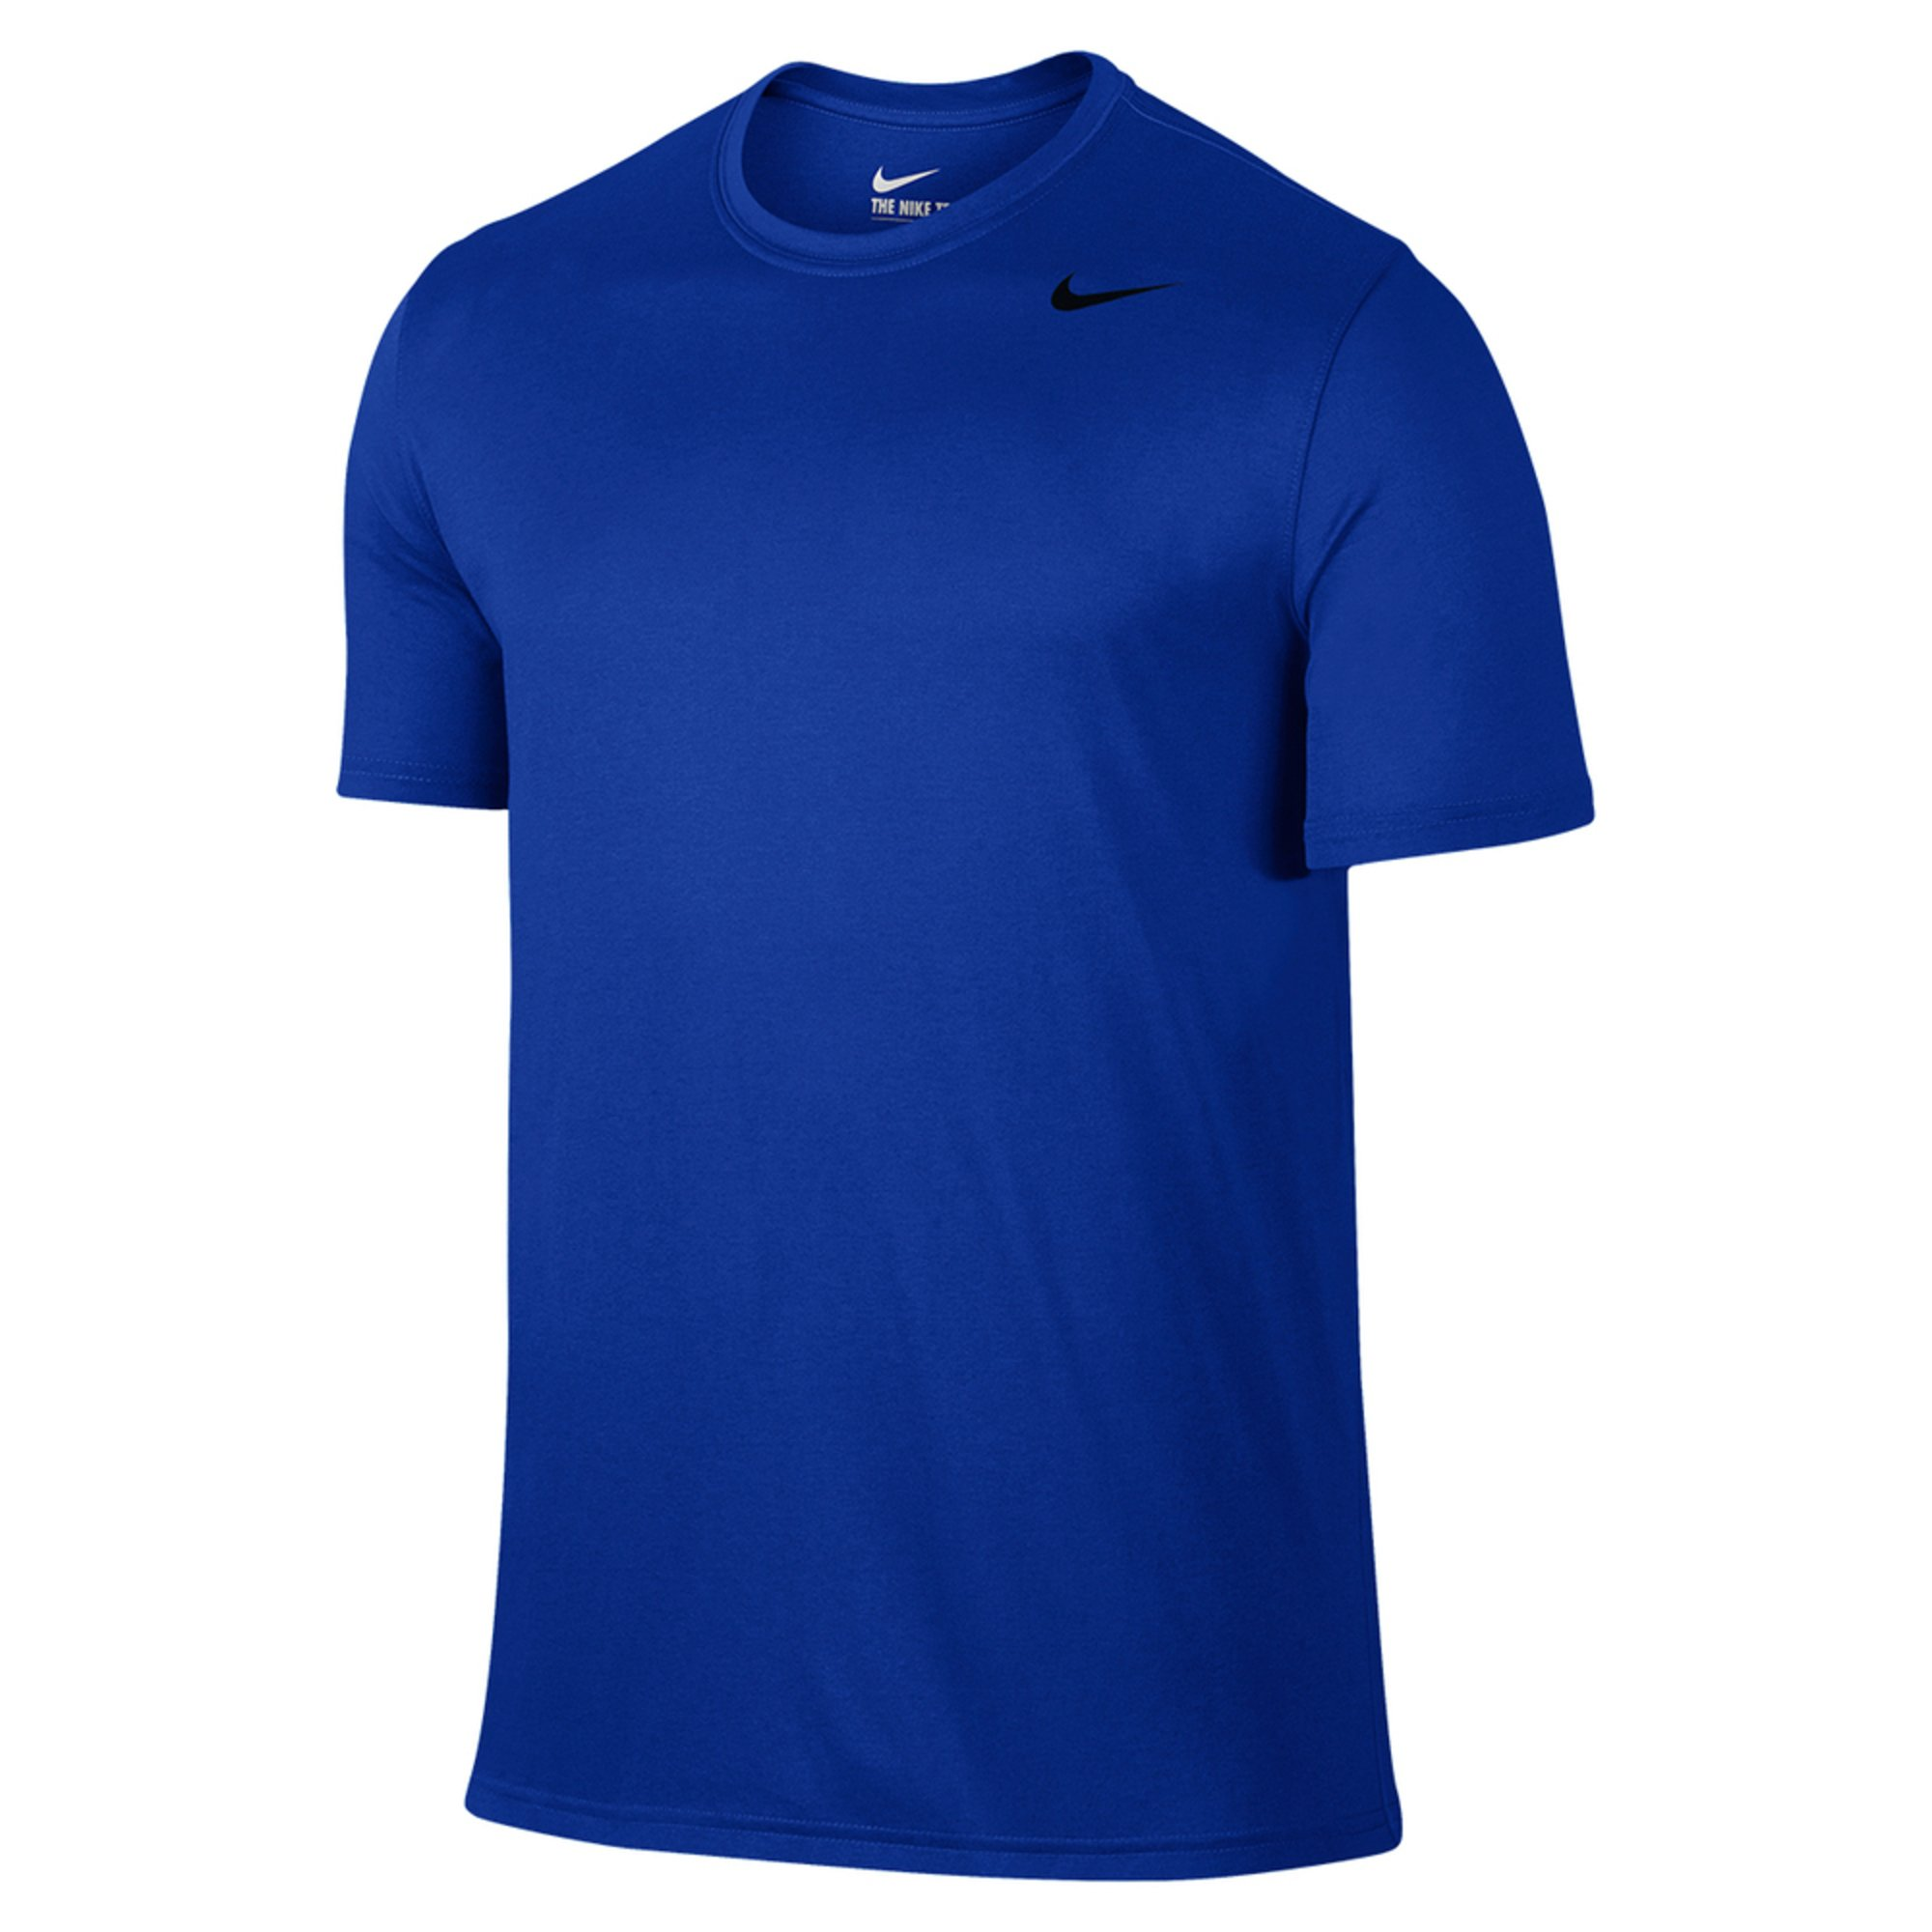 756839d2 Nike Men's Legend 2.0 Short Sleeve Tee   Active Tees   Apparel ...